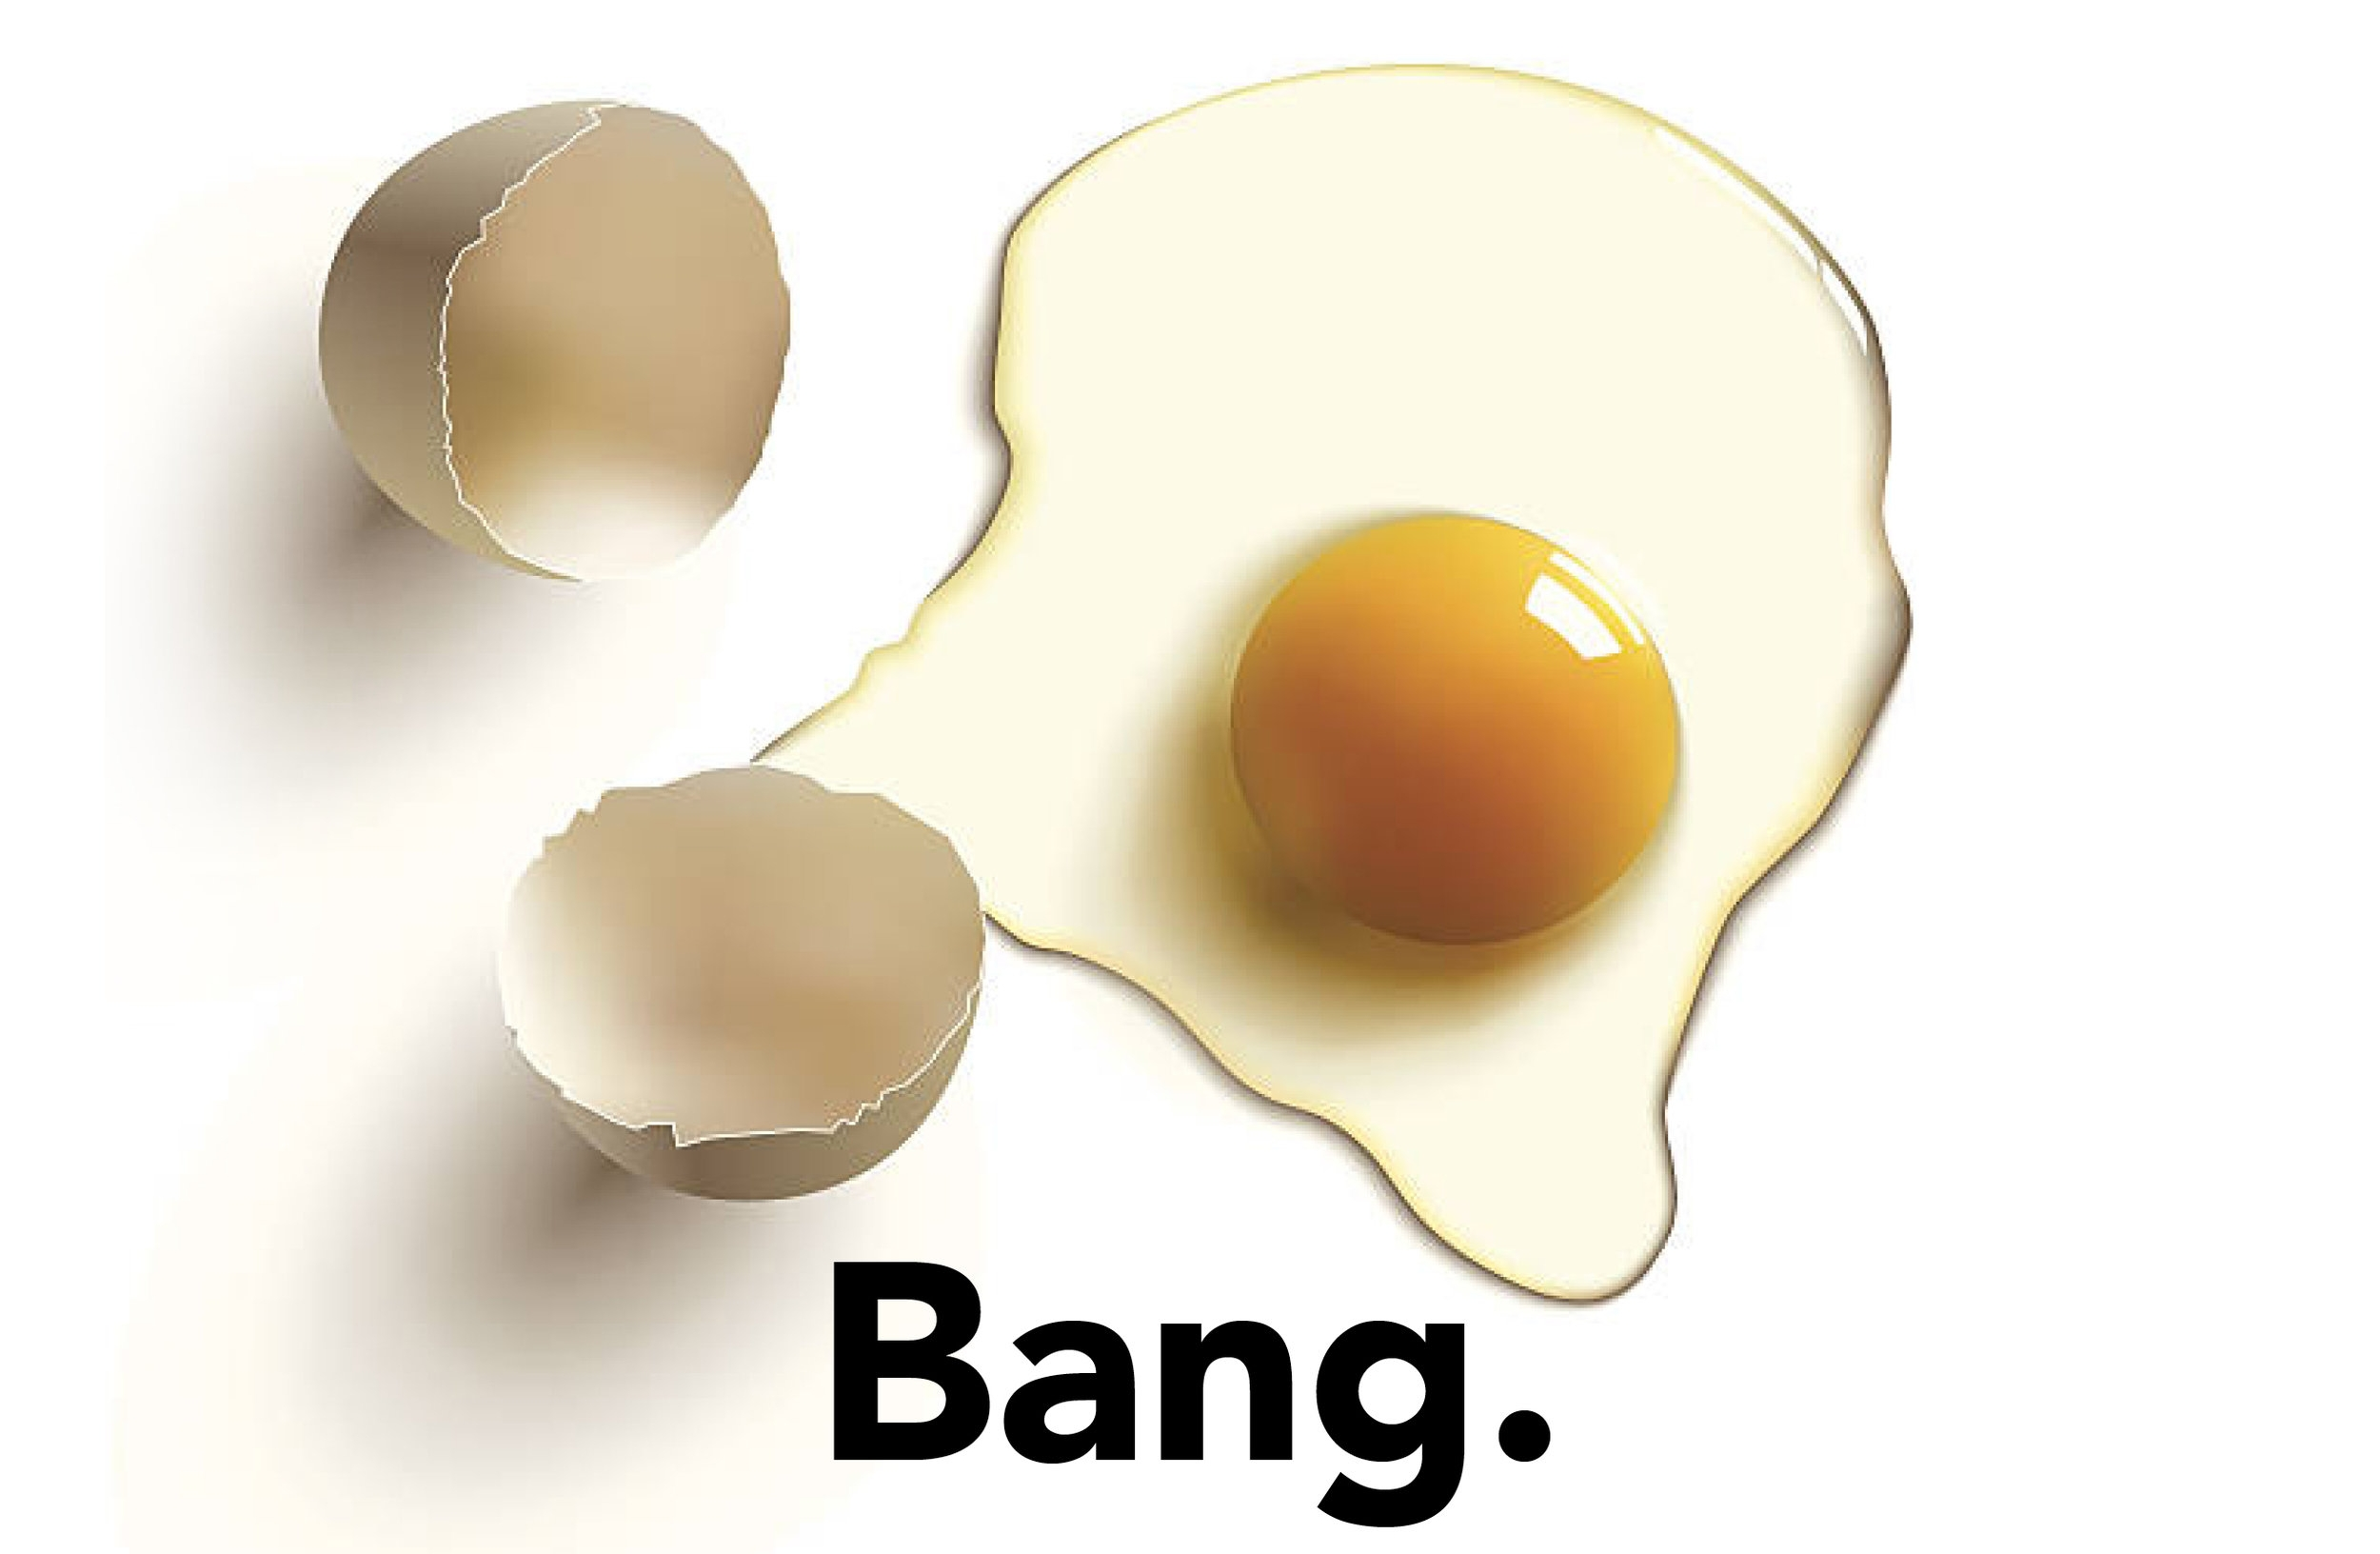 Bang, bing, bong, blast, blowwie! Into Fenske's class I go